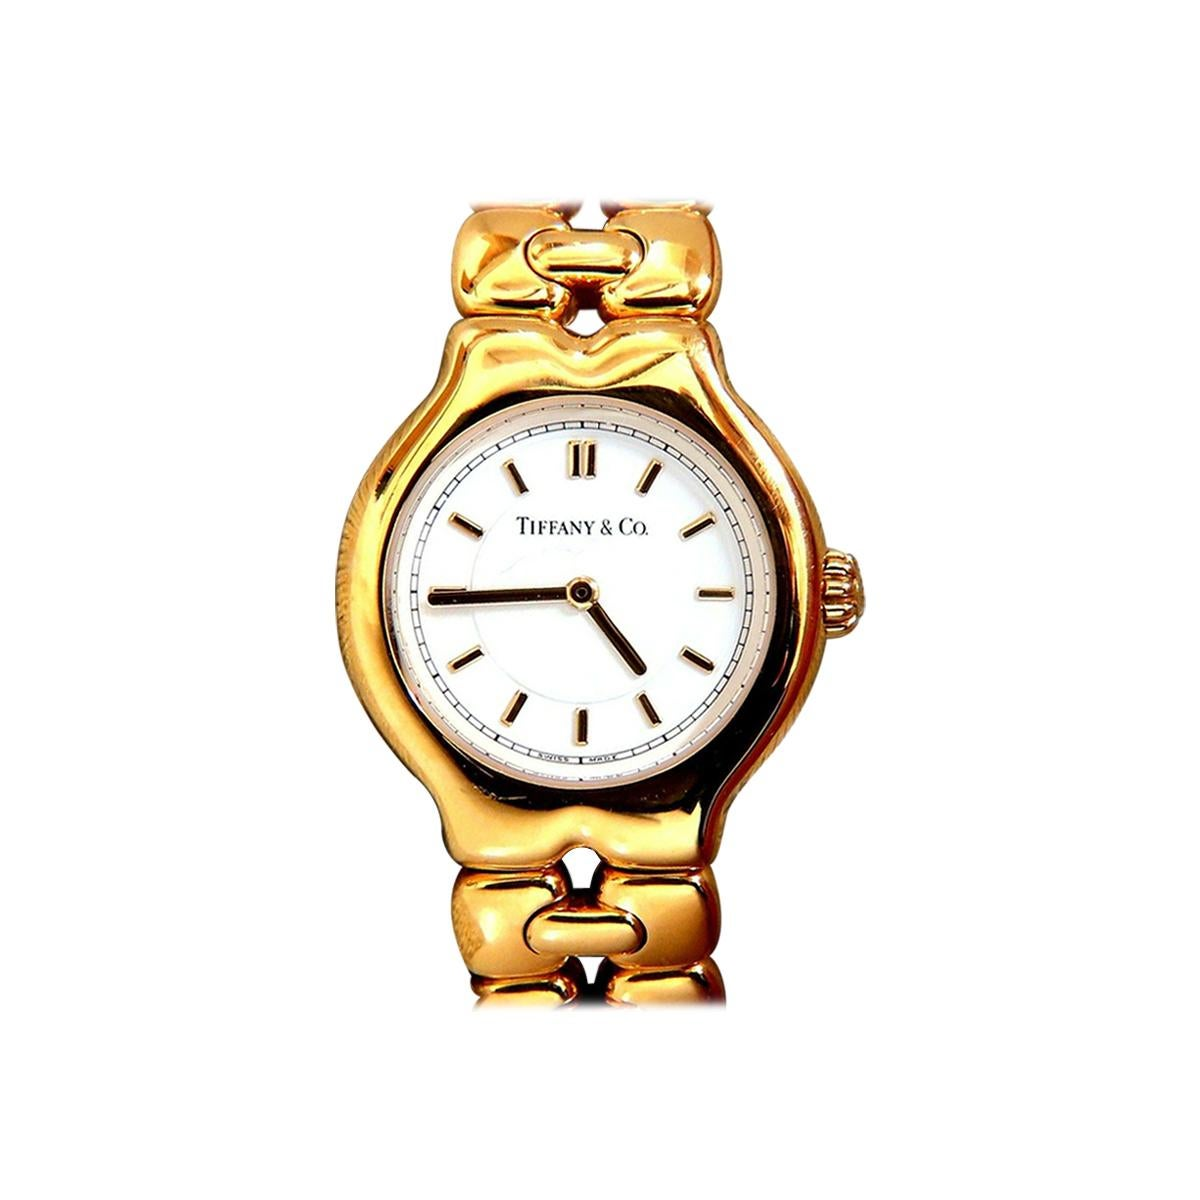 Authentic Tiffany & Co. Tesoro 18 Karat Gold Watch